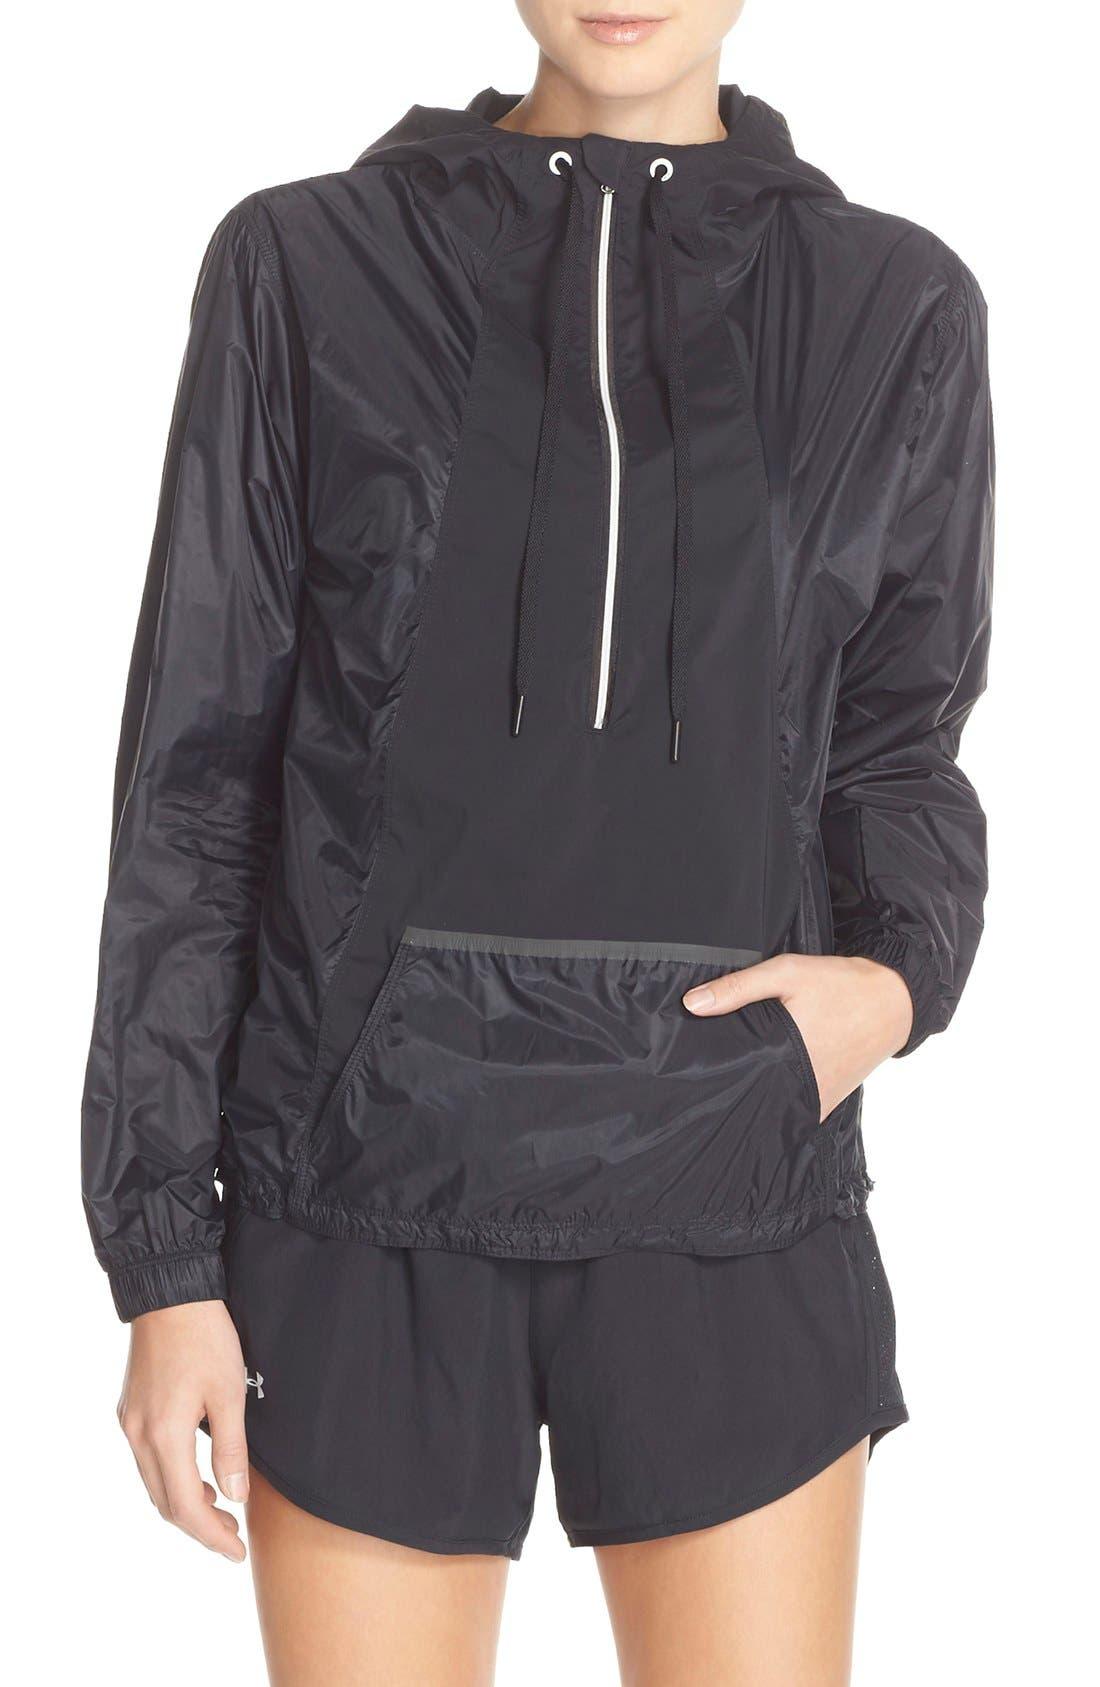 Main Image - Under Armour 'Roga' Half Zip Jacket